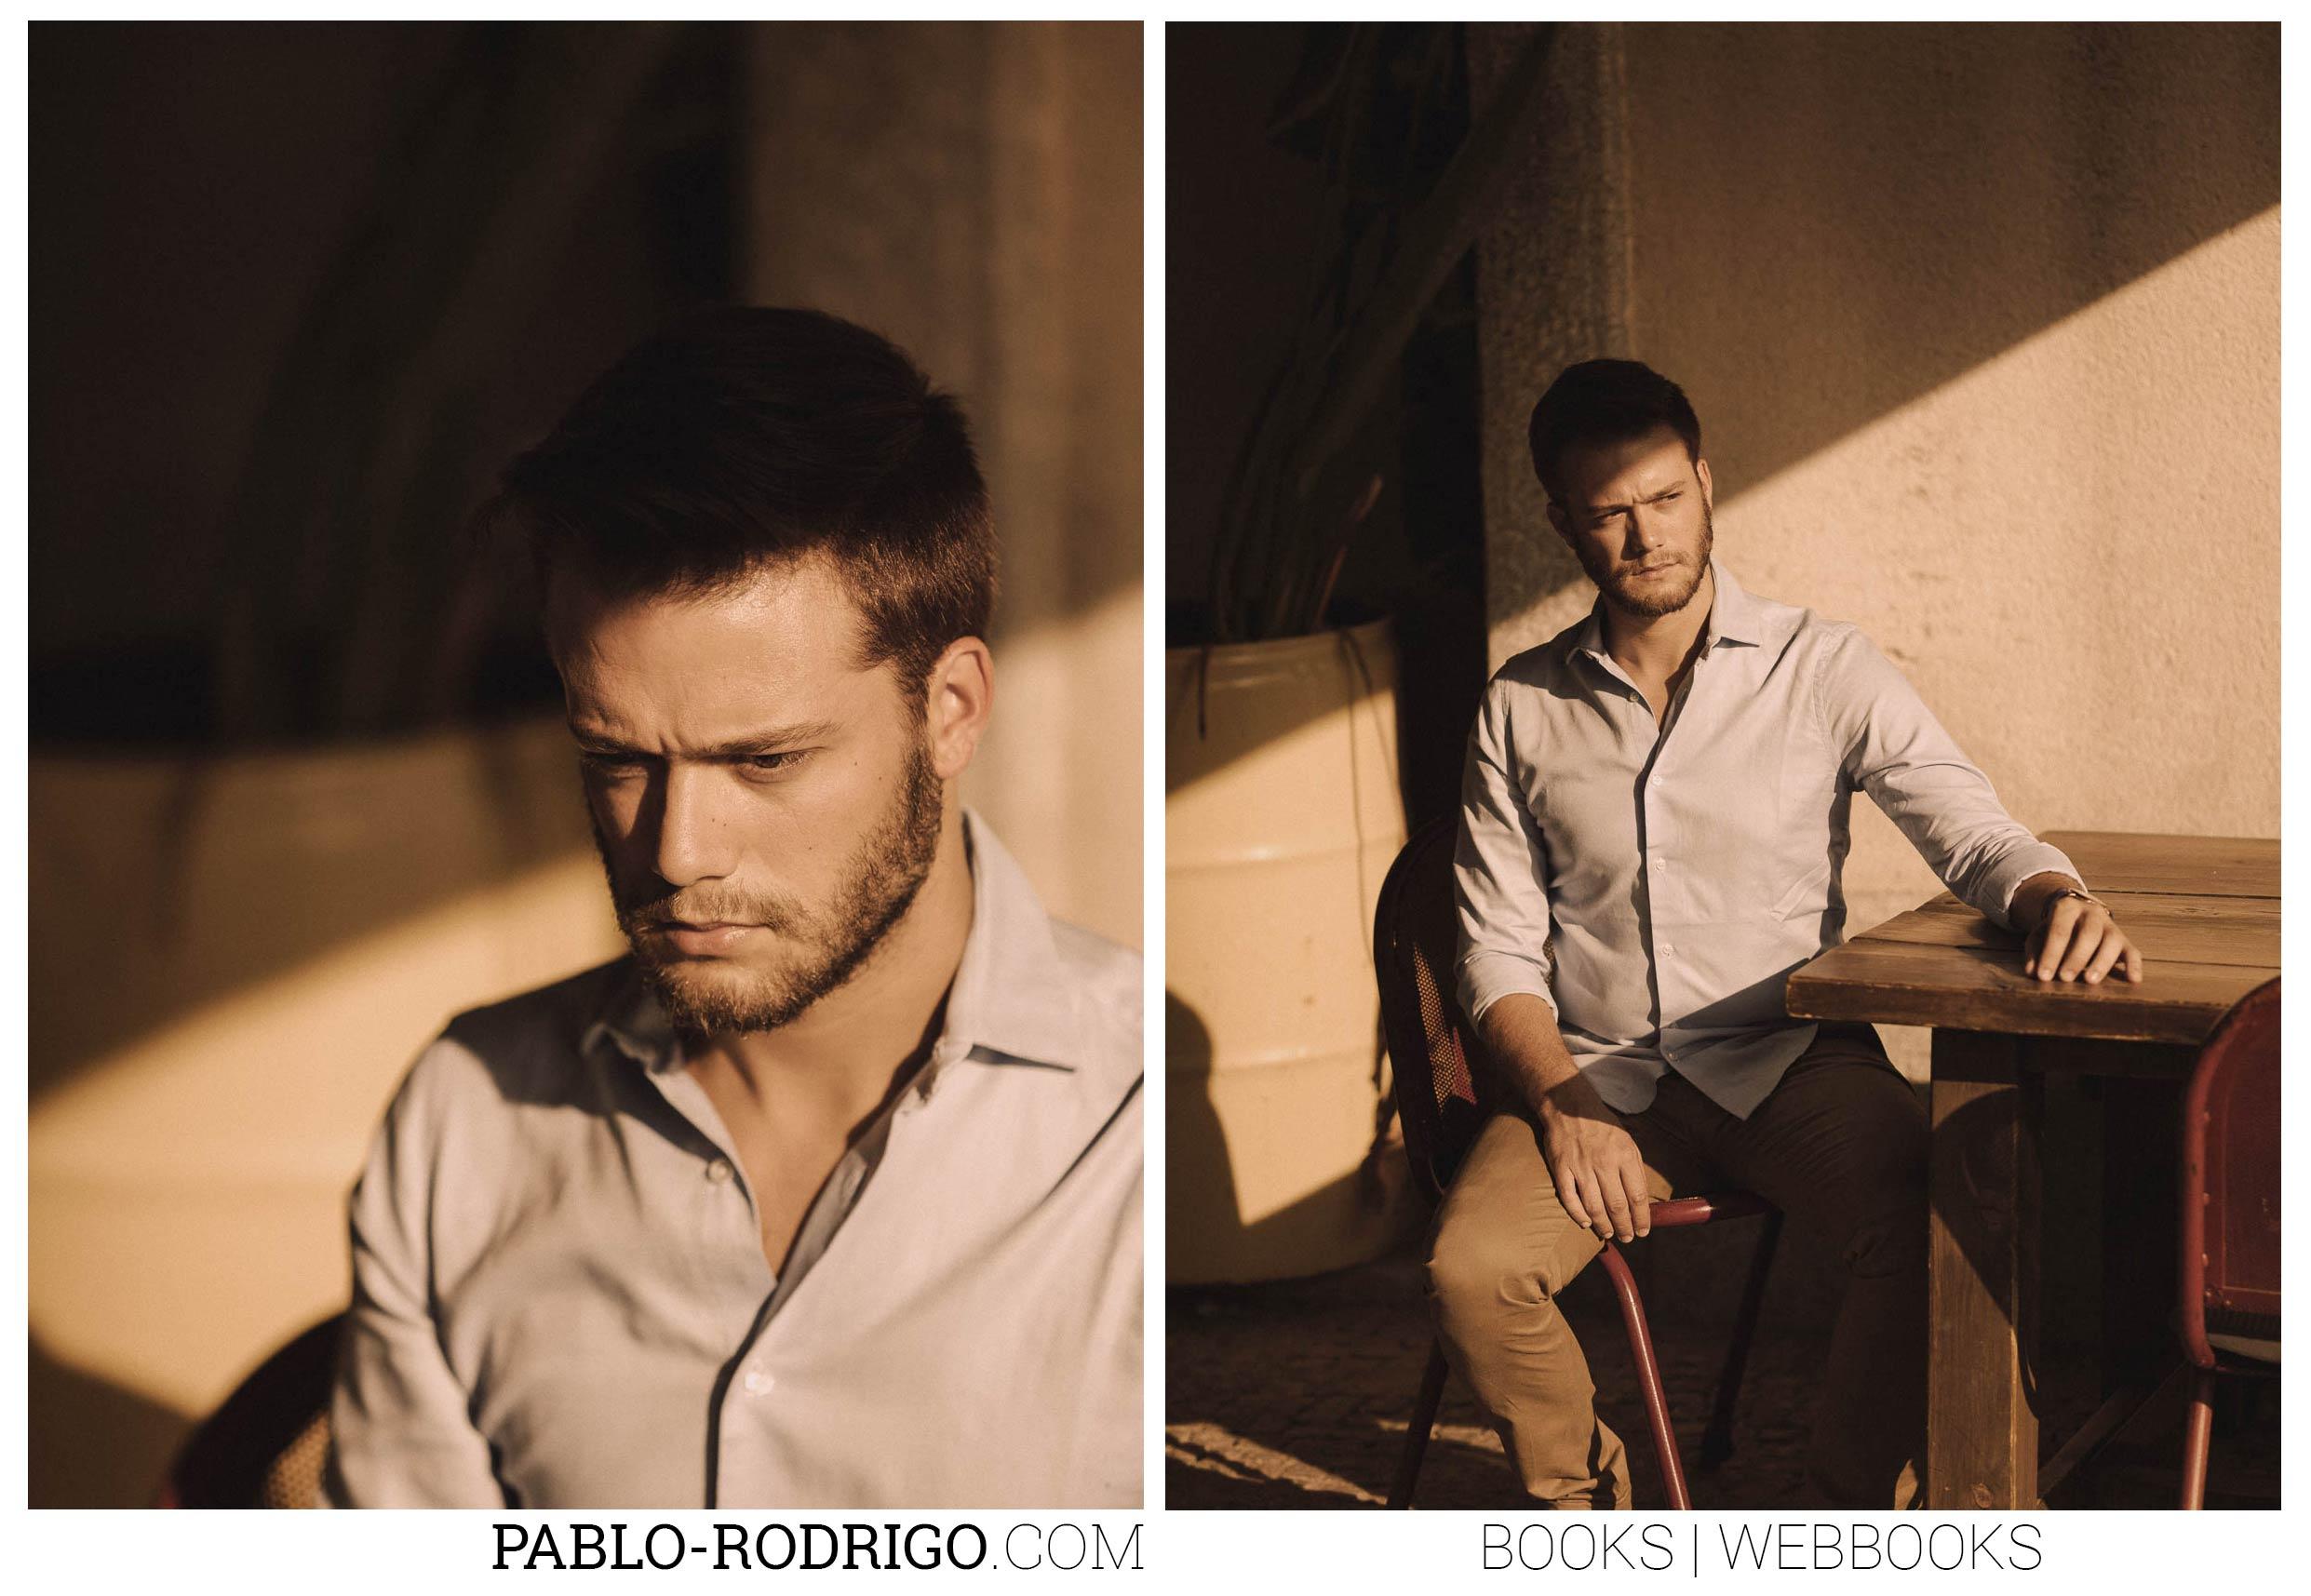 Sesión TEST para el actor Jaime Riba, Madrid 2017